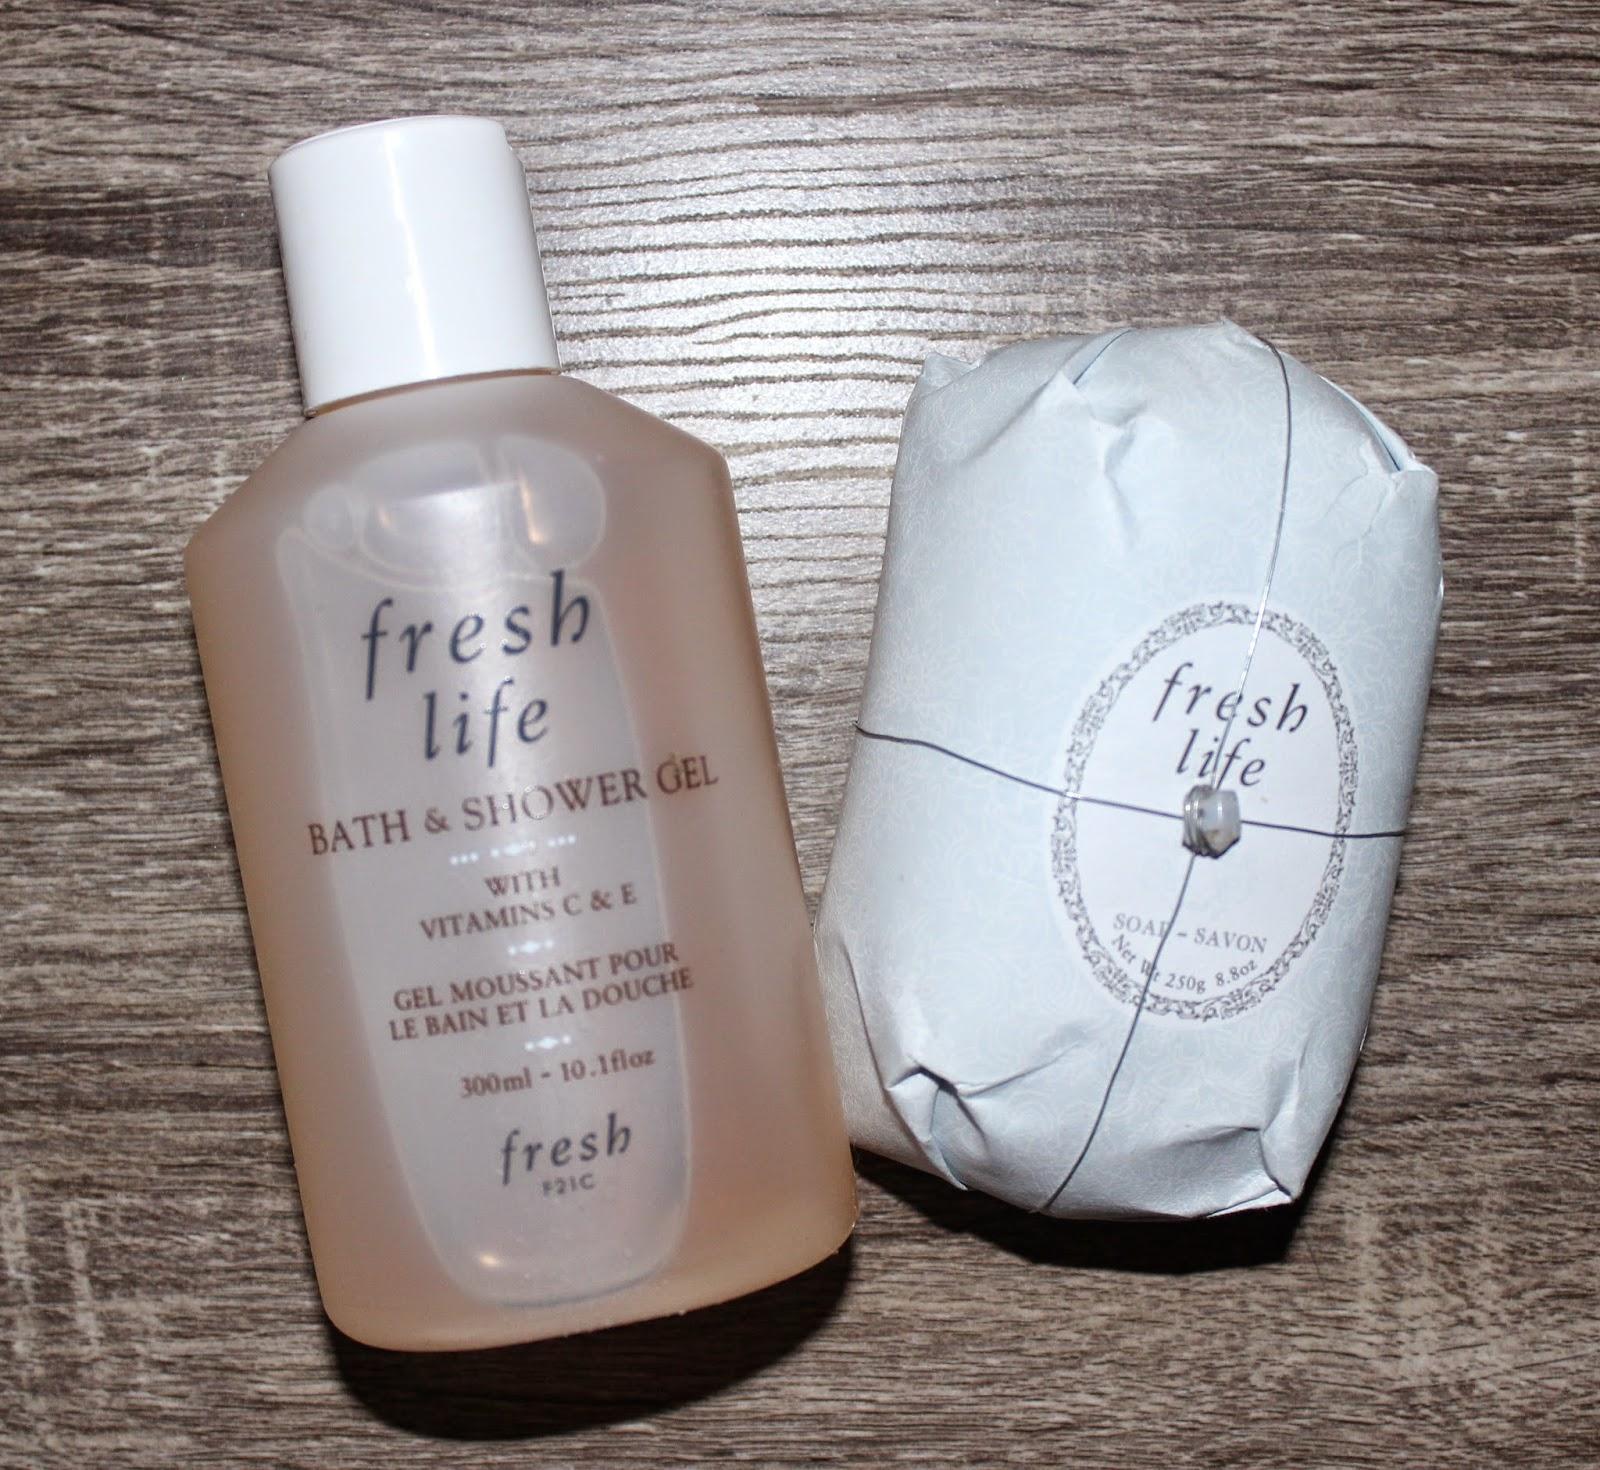 Fresh Life Bath & Shower Gel and Oval Soap